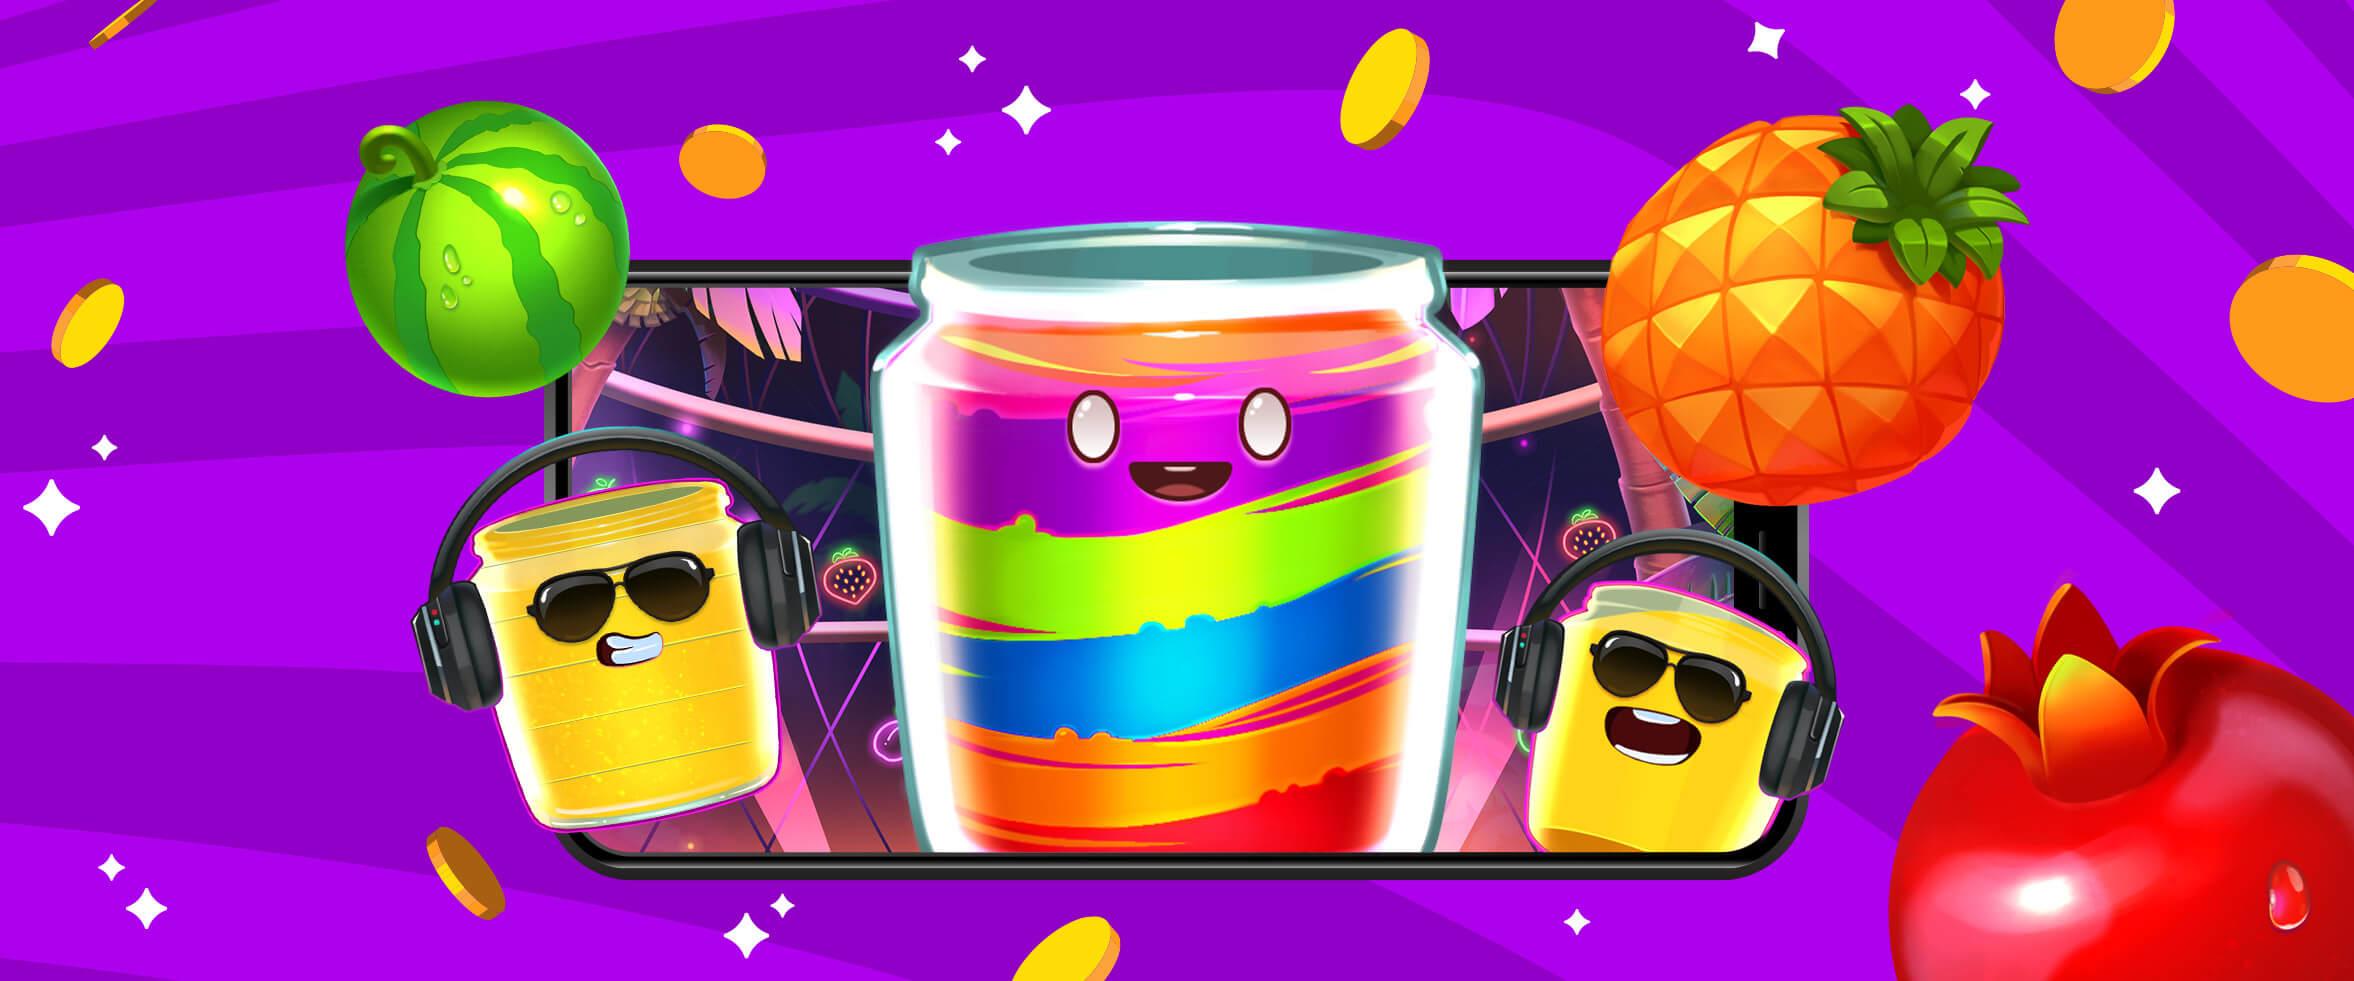 Jammin' Jars 2 is now Live!